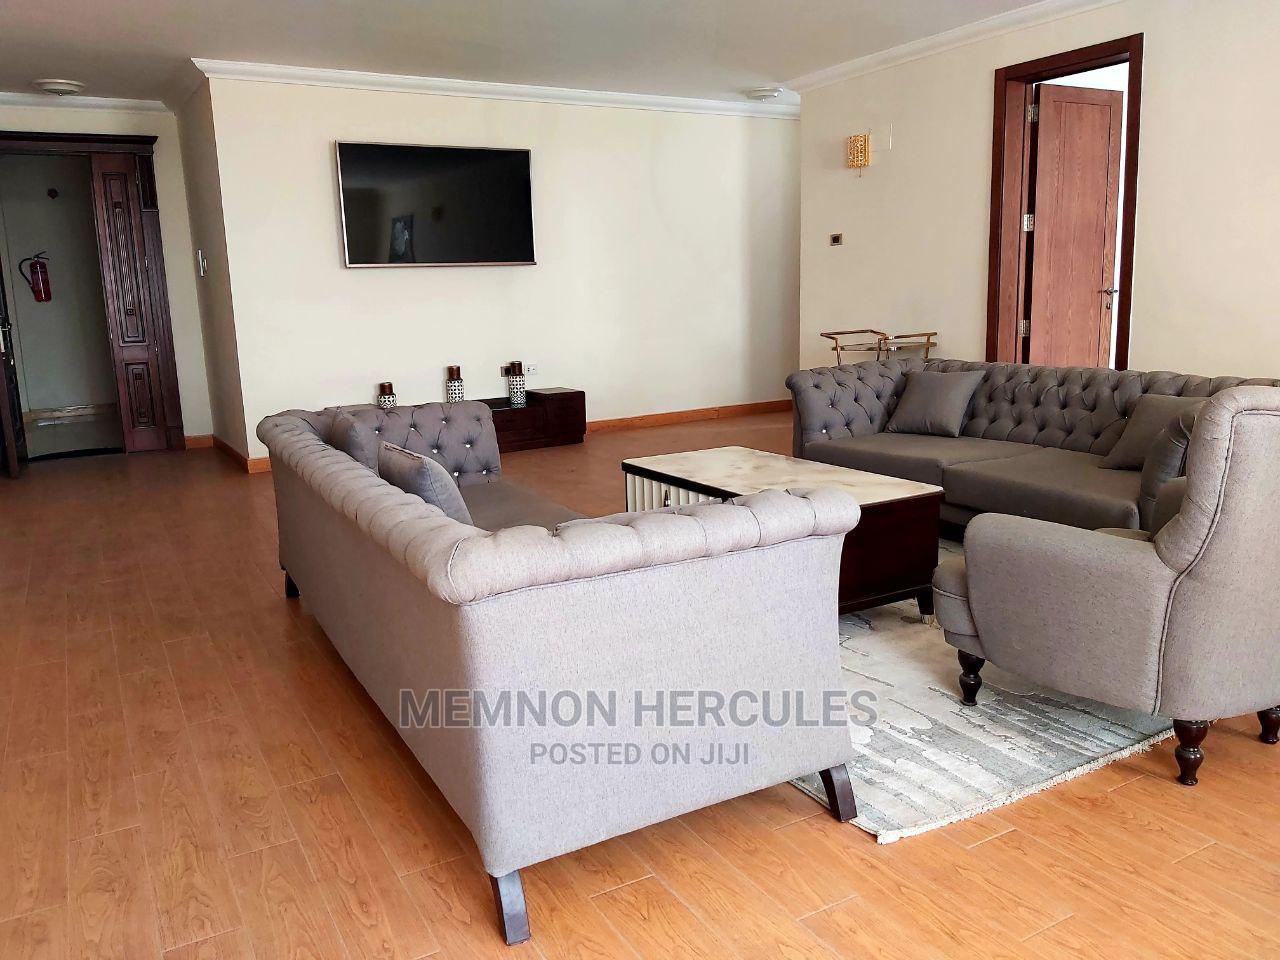 Archive: 3bdrm Apartment in Comet, Bole for sale